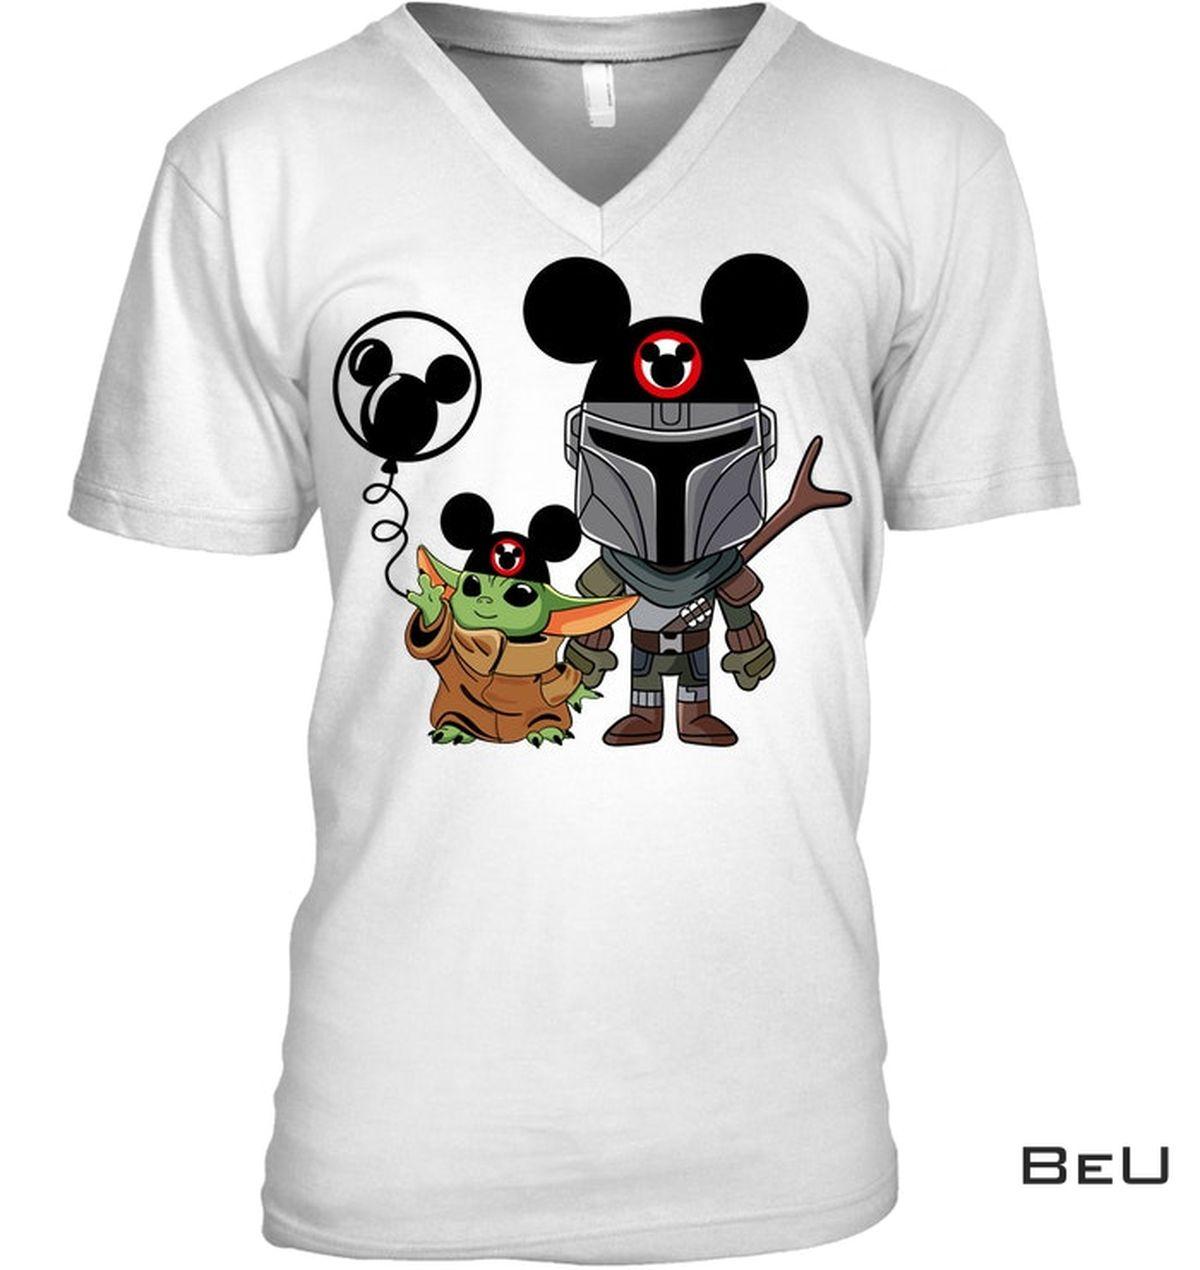 Mickey Mouse Baby Yoda Shirt